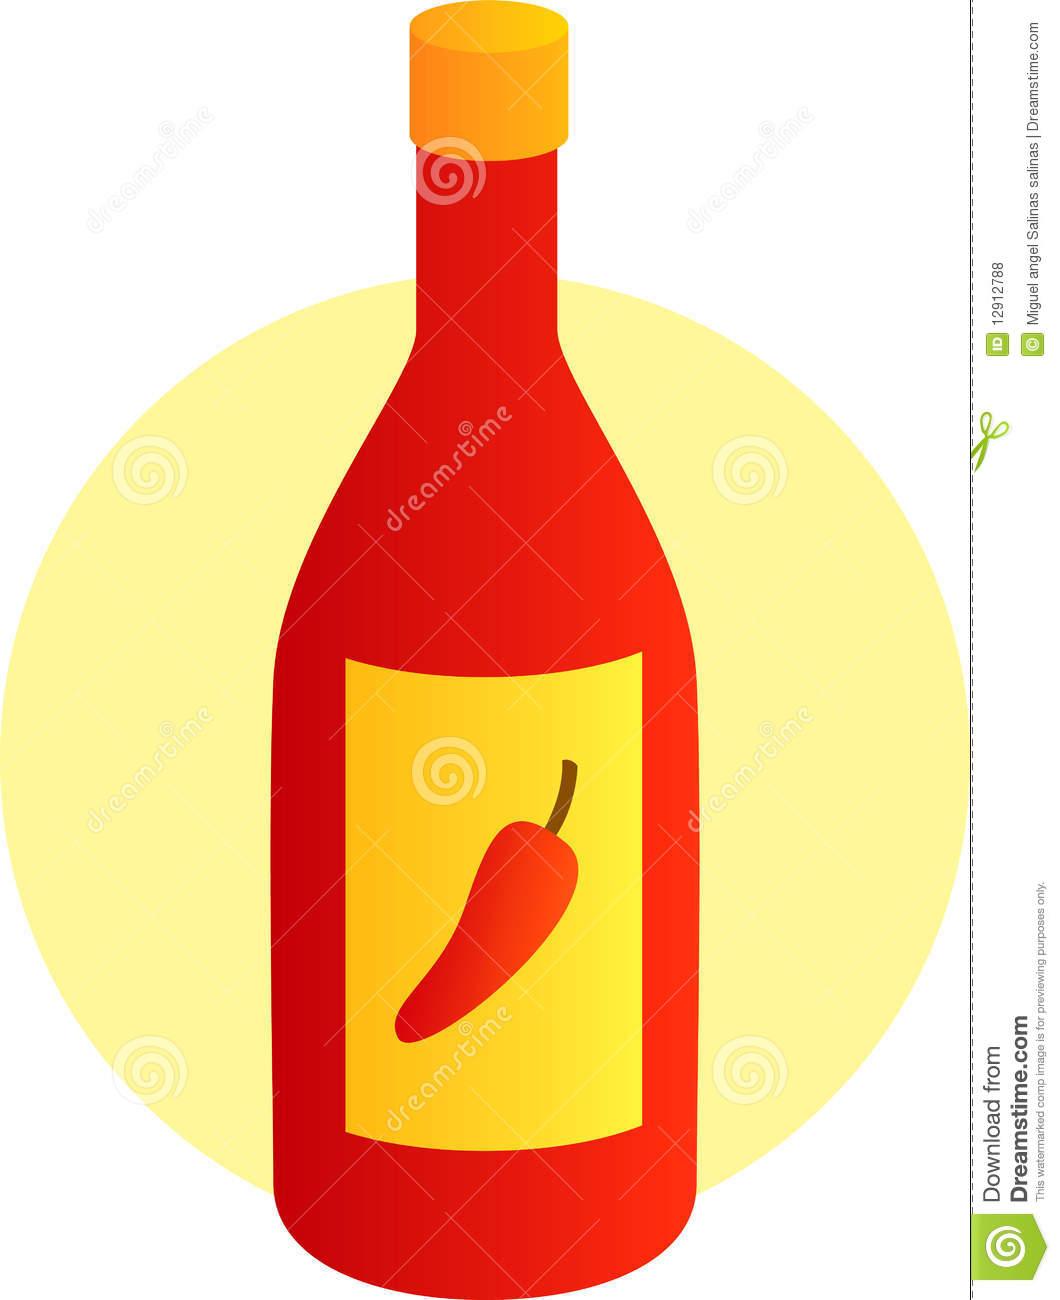 Hot sauce bottle clipart.